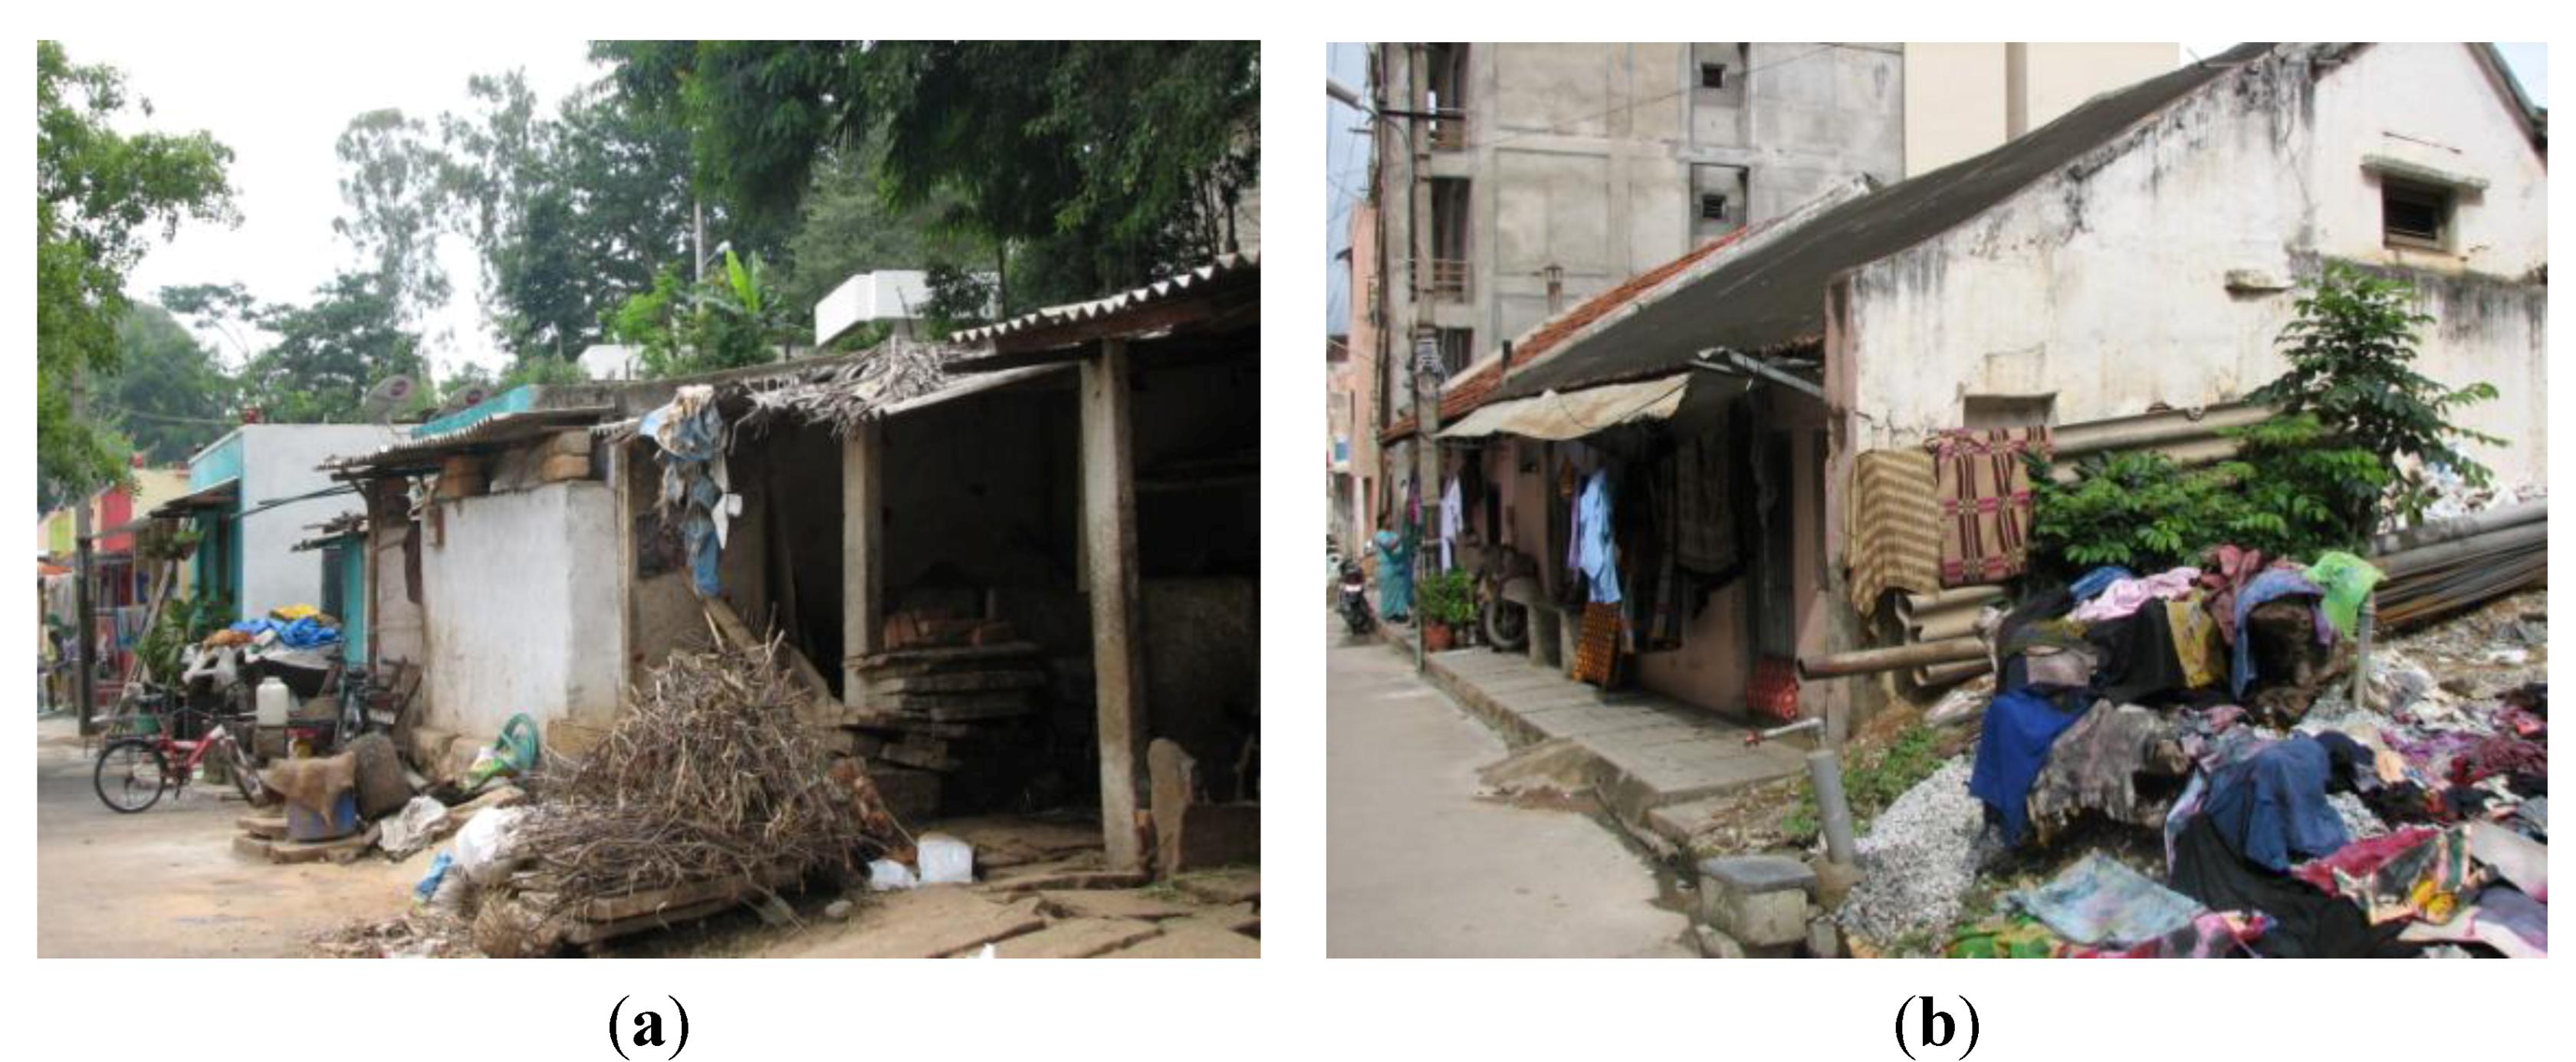 Sub urban area in bangalore dating